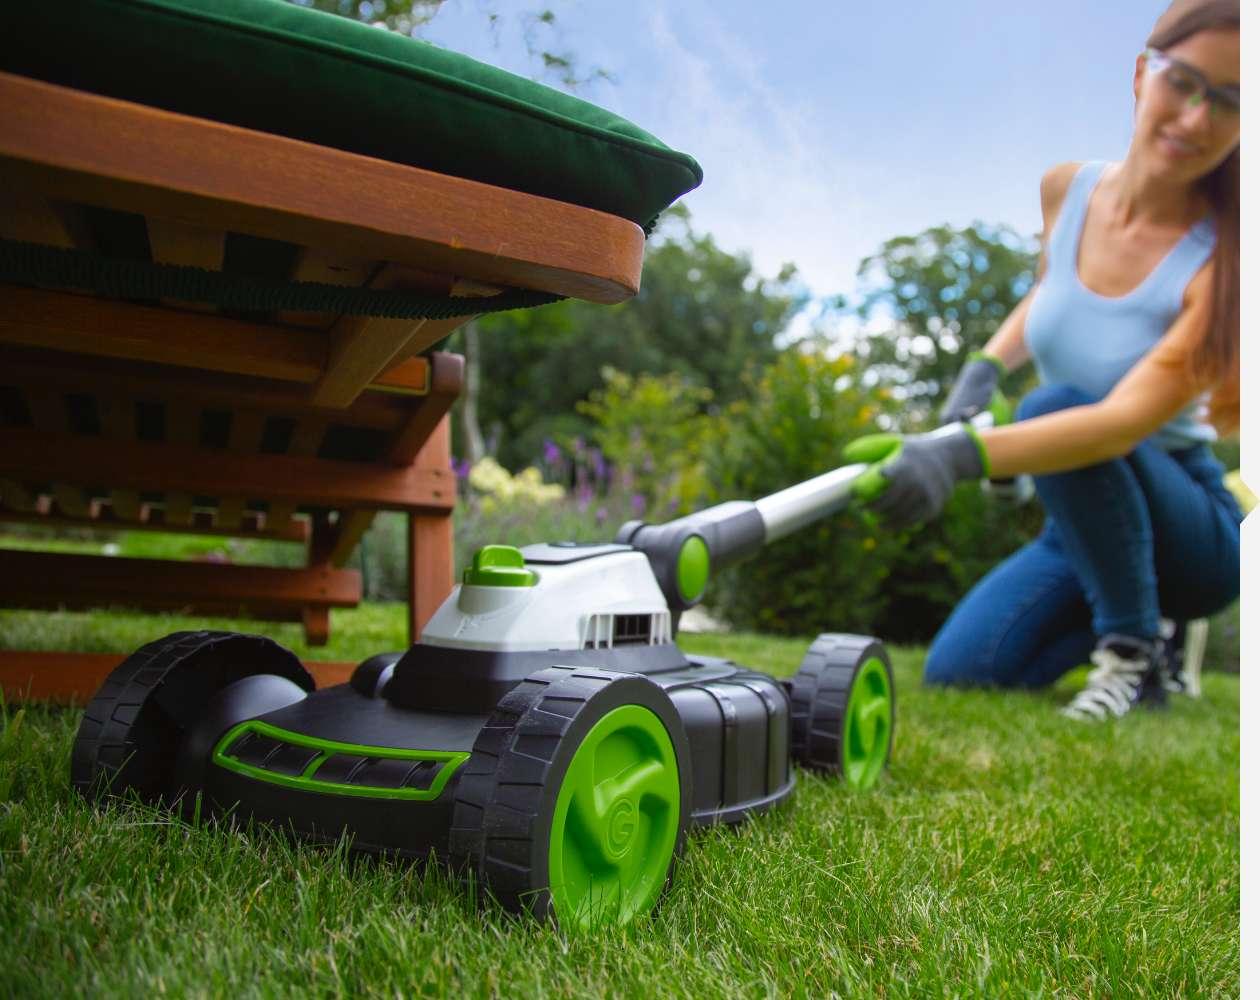 Mini lawnmower low profile handle